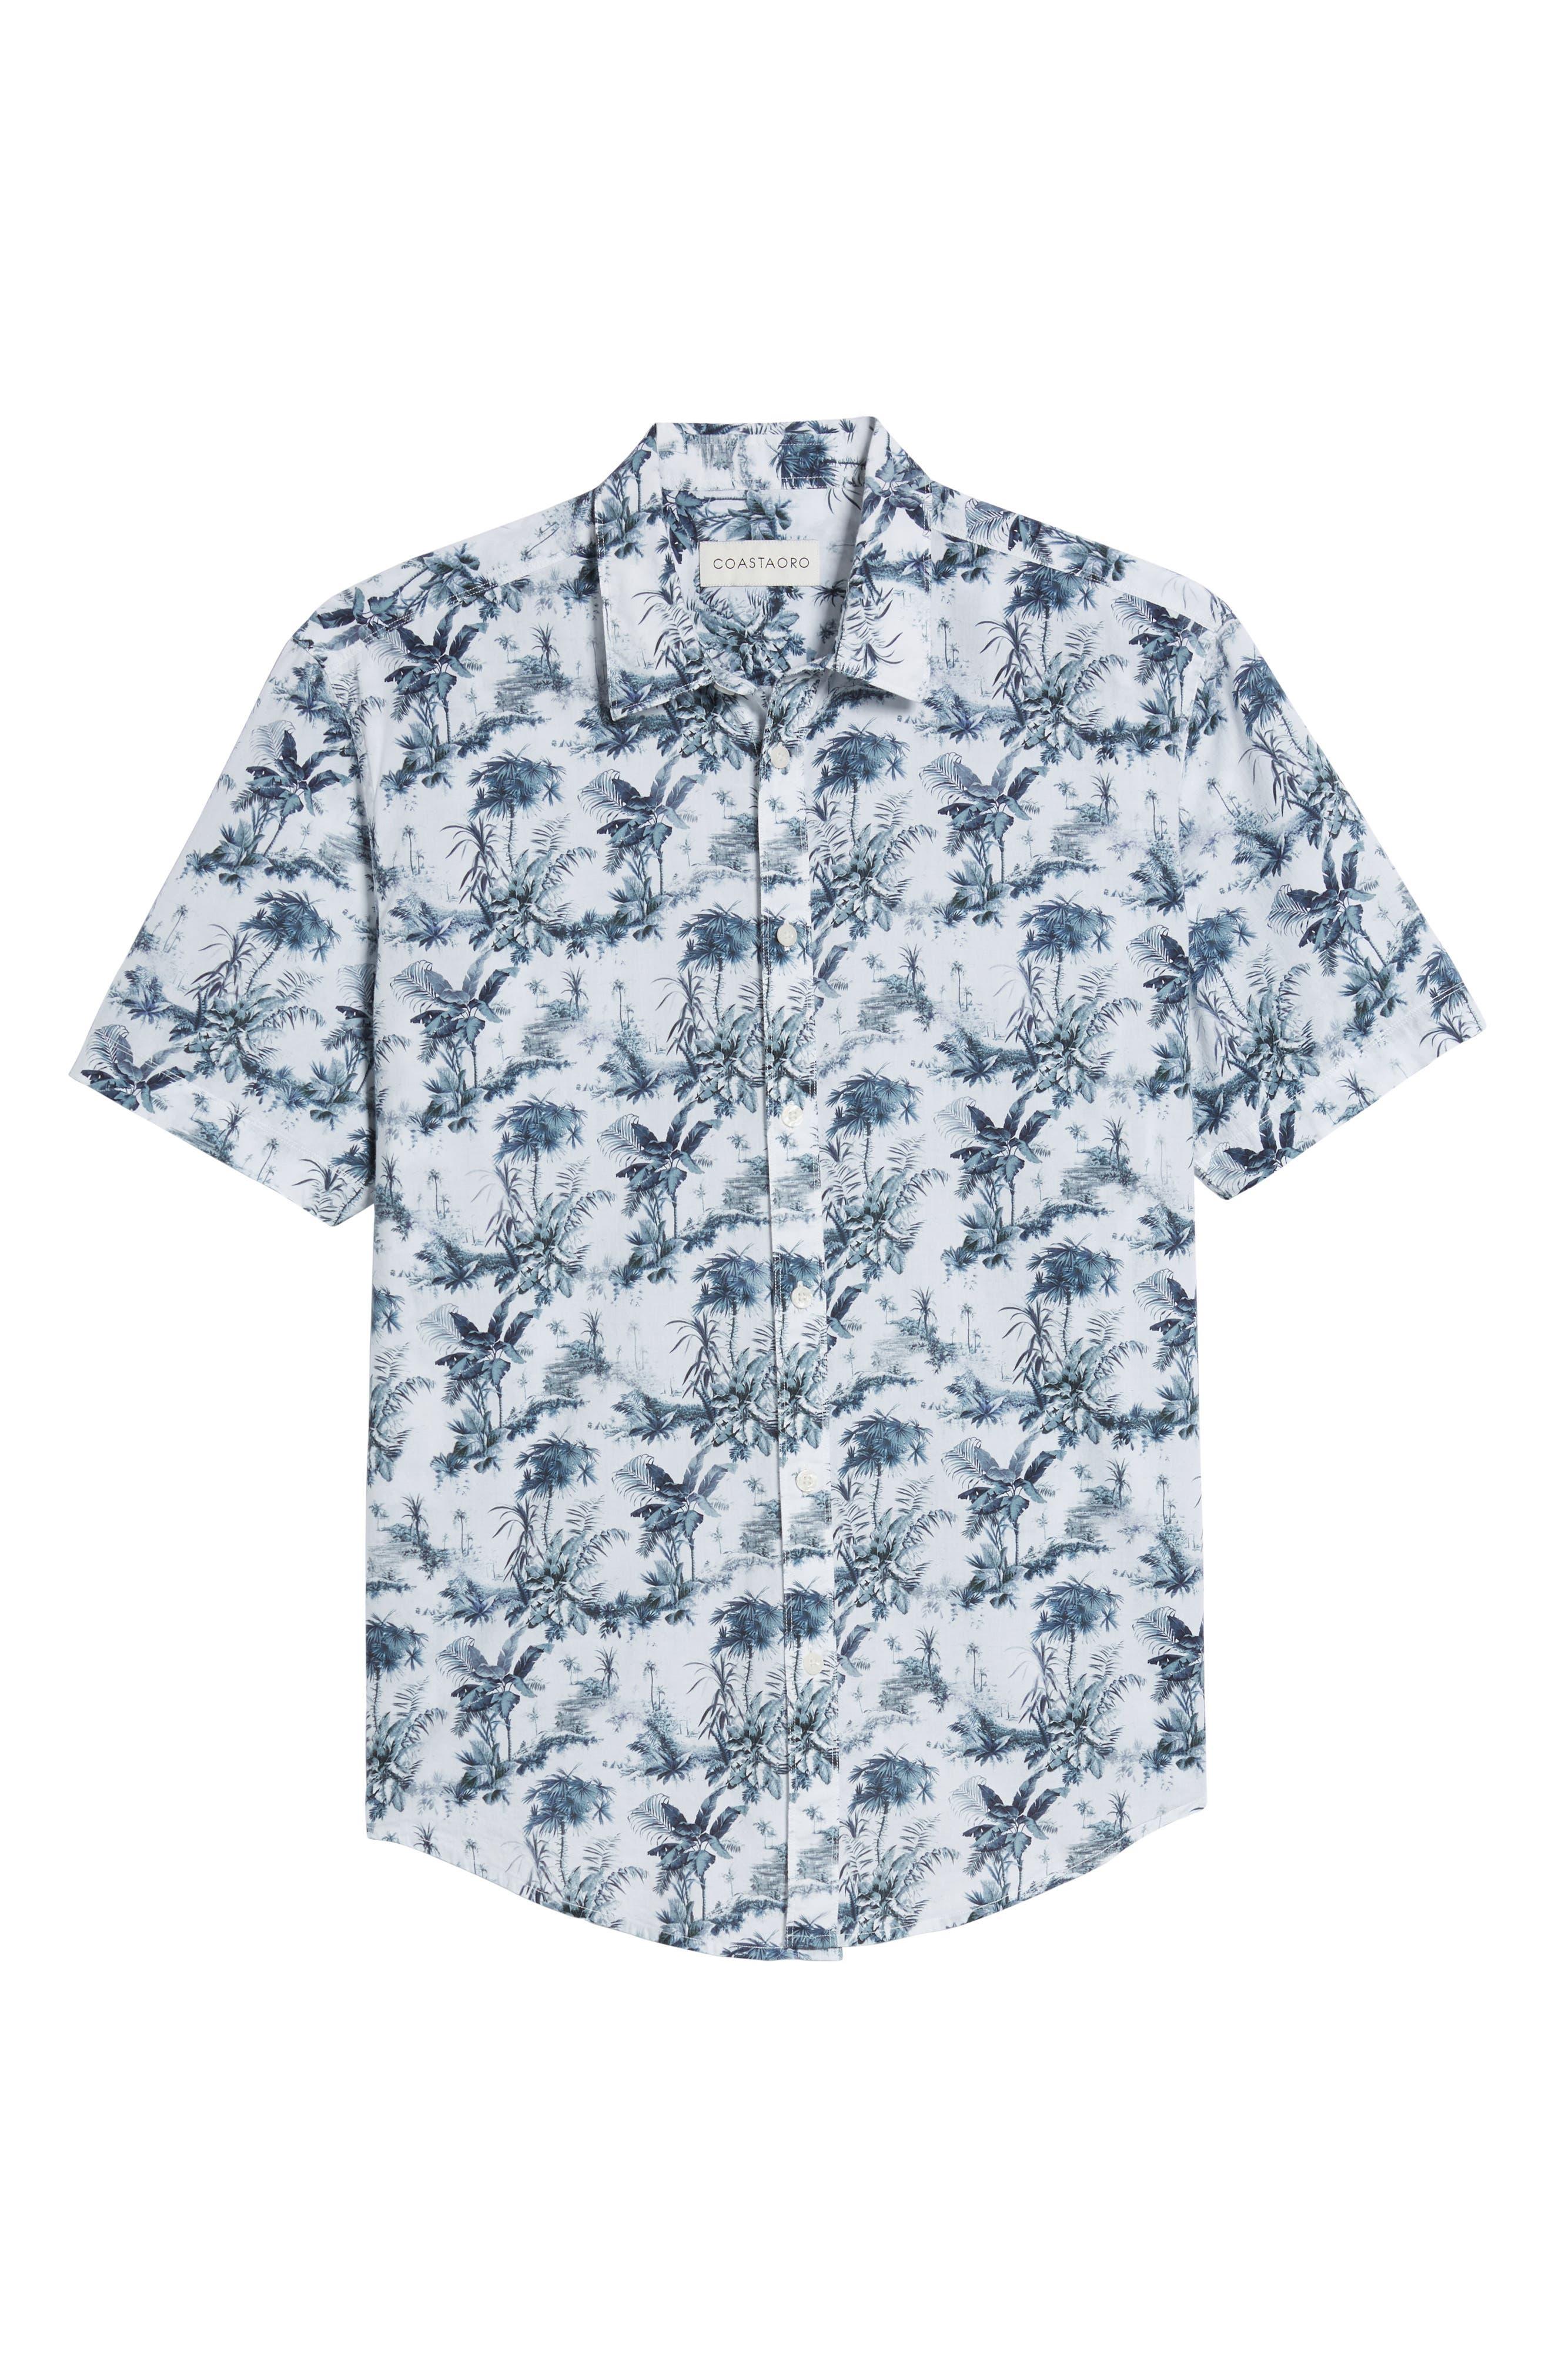 Waiki Regular Fit Short Sleeve Sport Shirt,                             Alternate thumbnail 6, color,                             100